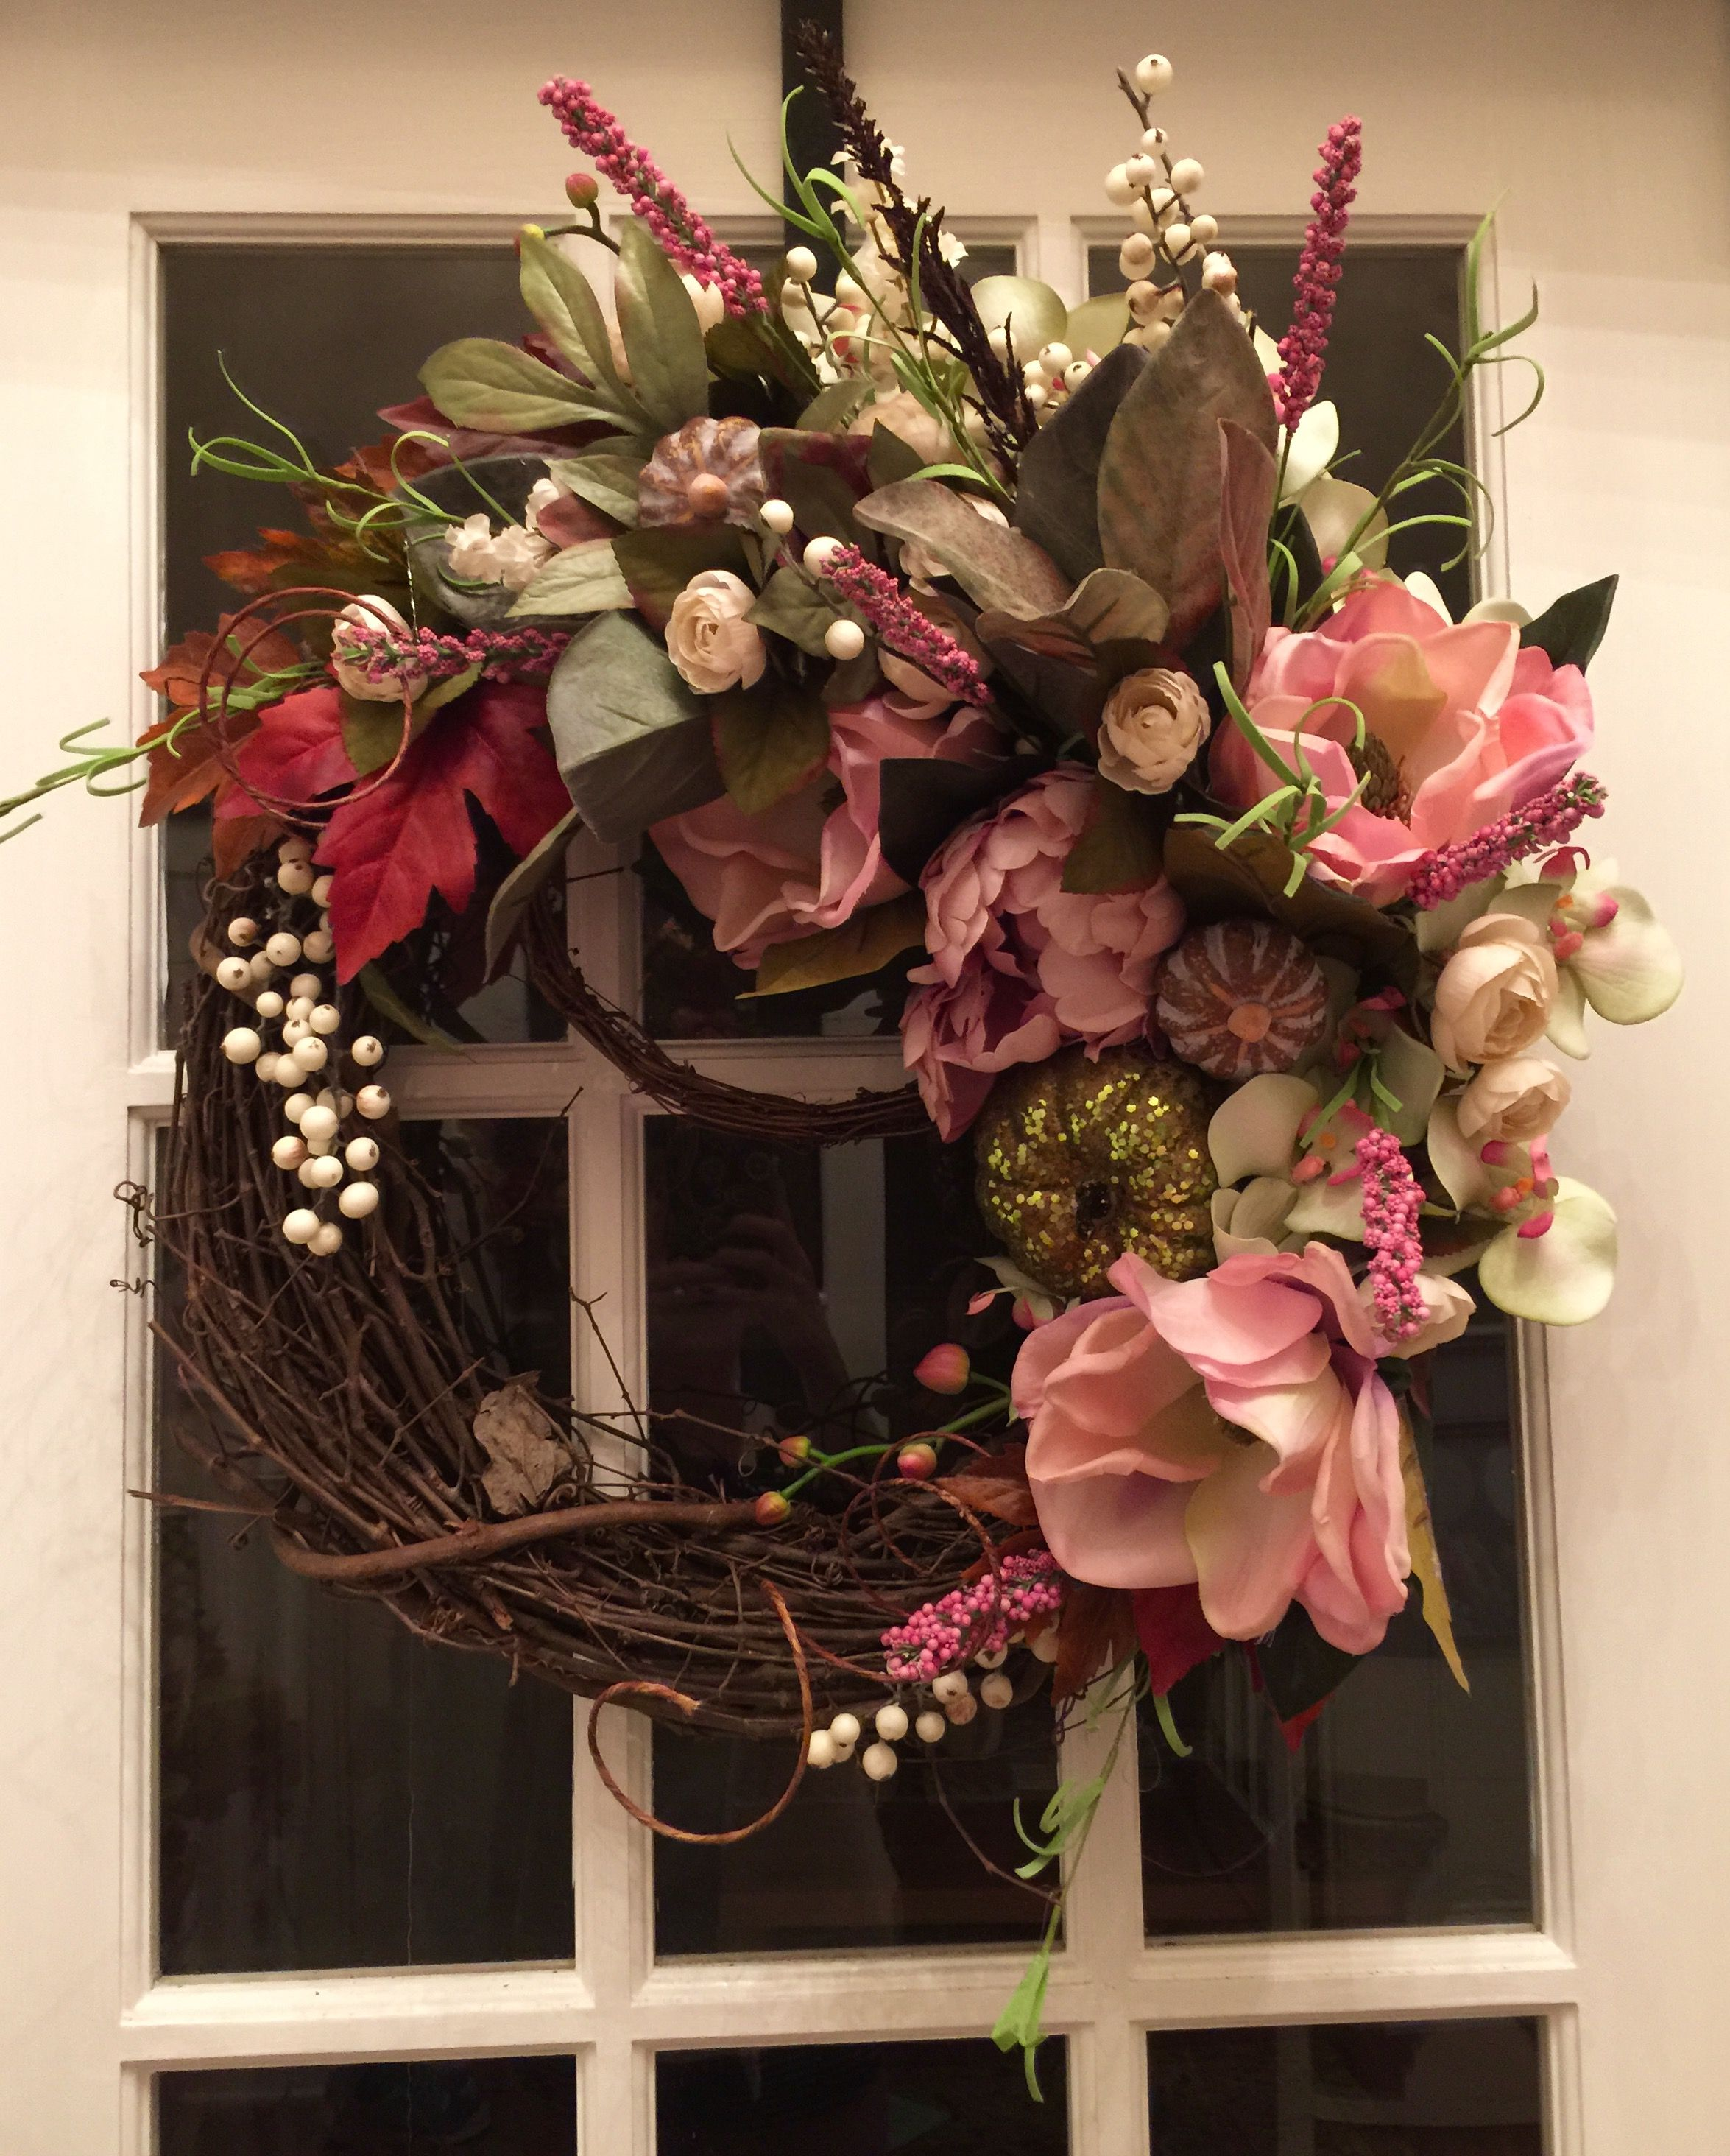 Summer Wreath, Spring Wreaths, Door Reefs, Grapevine Wreath, Door Design,  Flower Arrangement, Wall Pockets, Fall Decorations, Deco Mesh